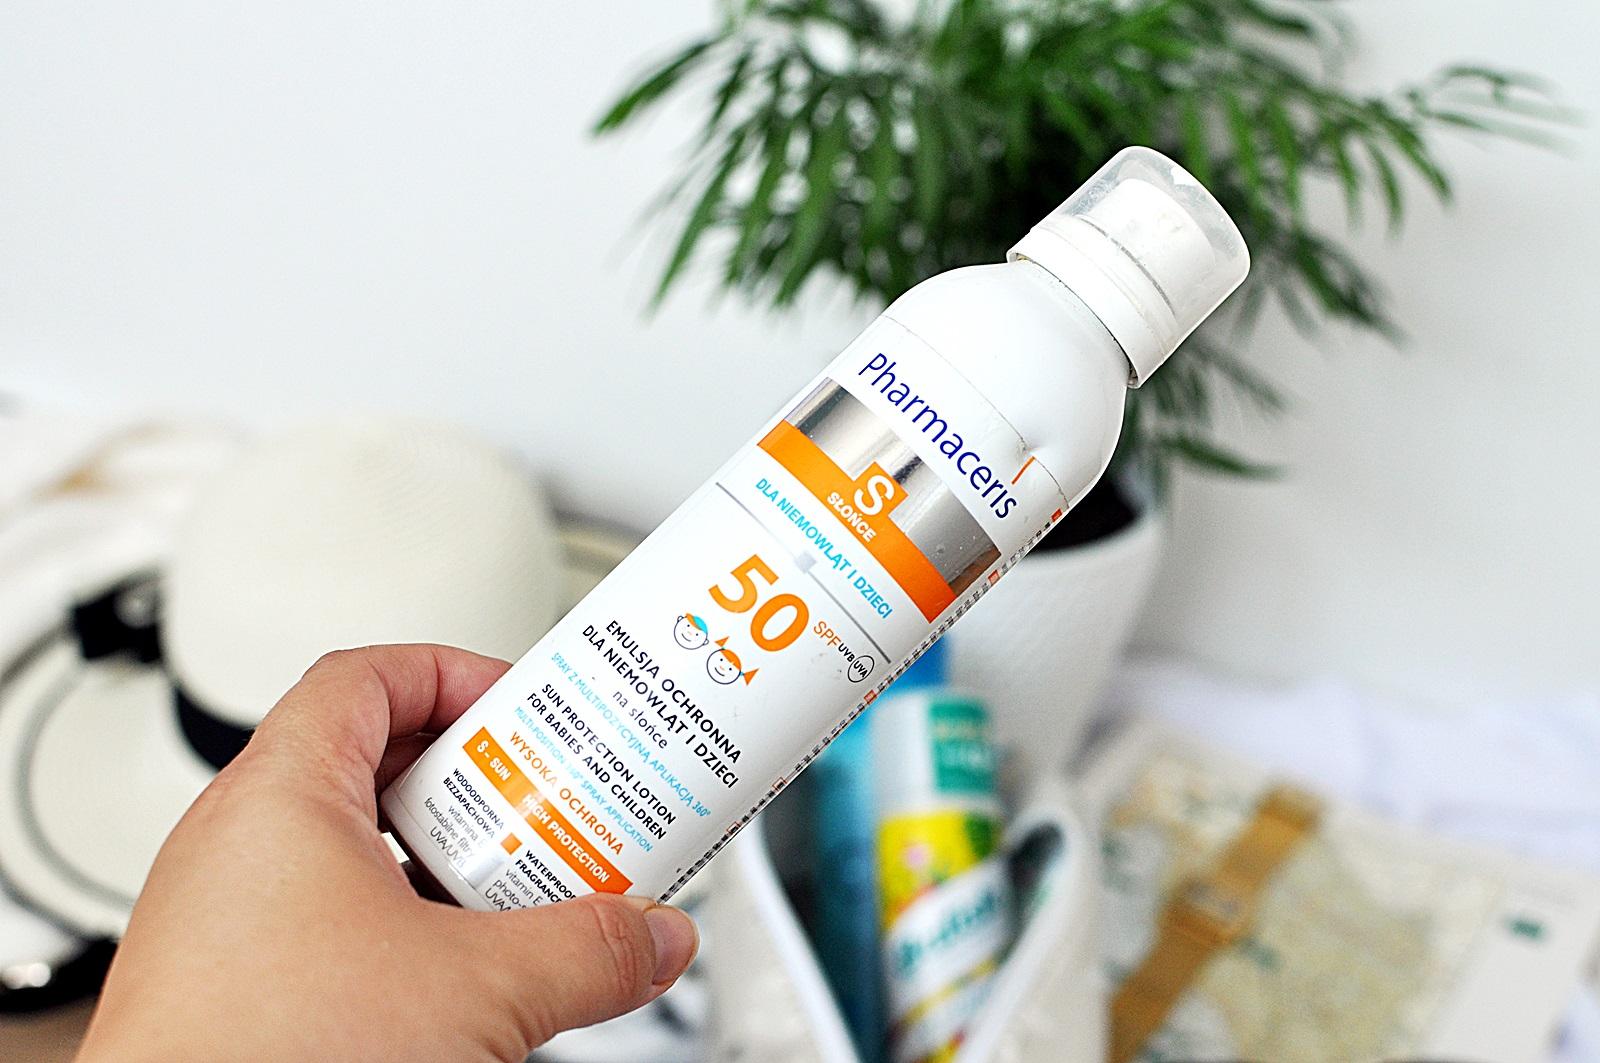 krem z filtrem UV SPF 50 jaki wybrać?